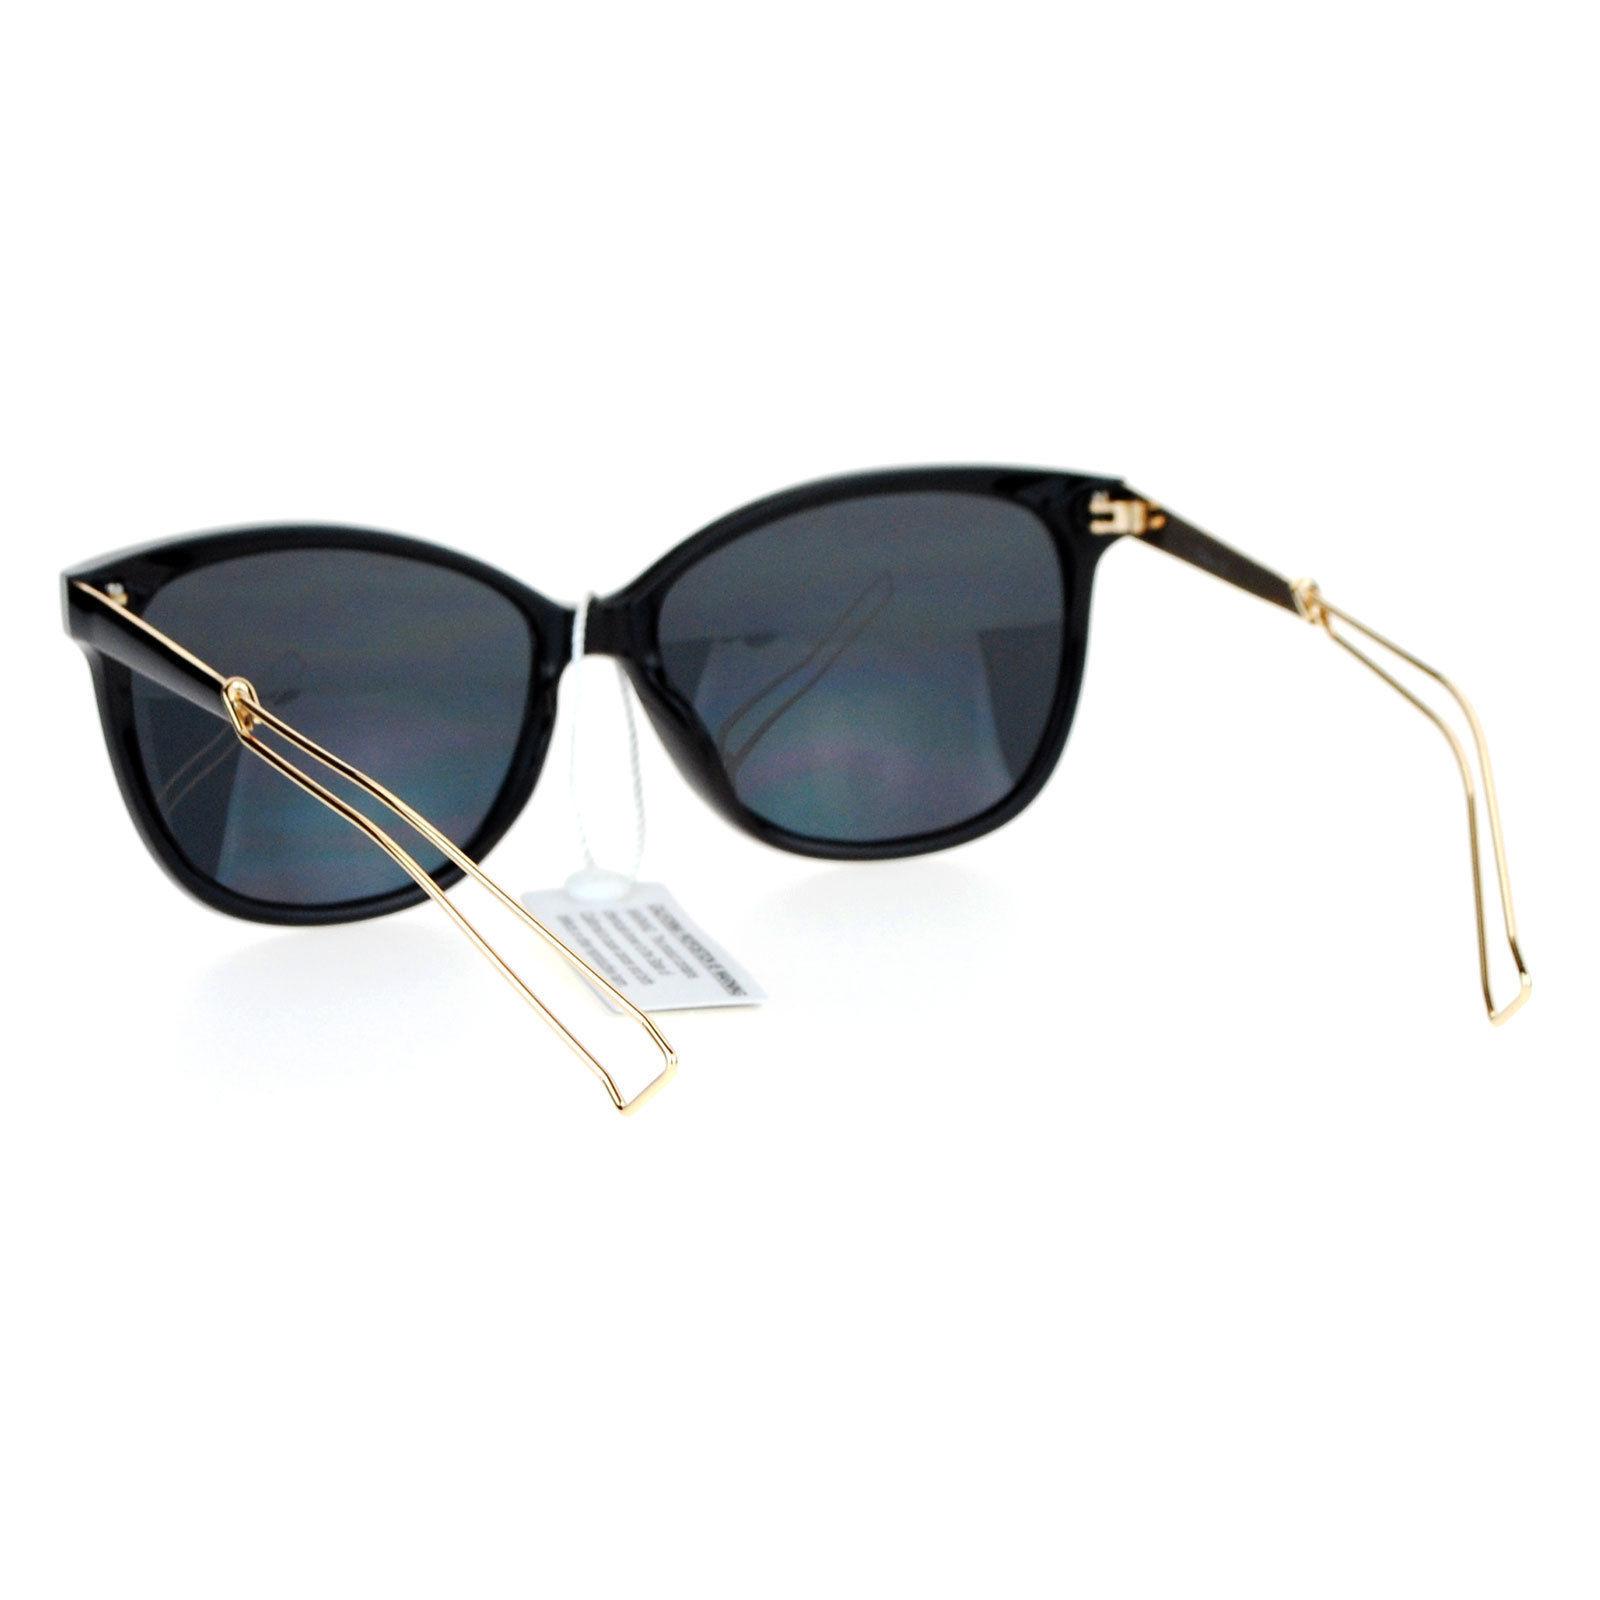 Womens Classic Fashion Sunglasses Designer Chic Clean Style UV400